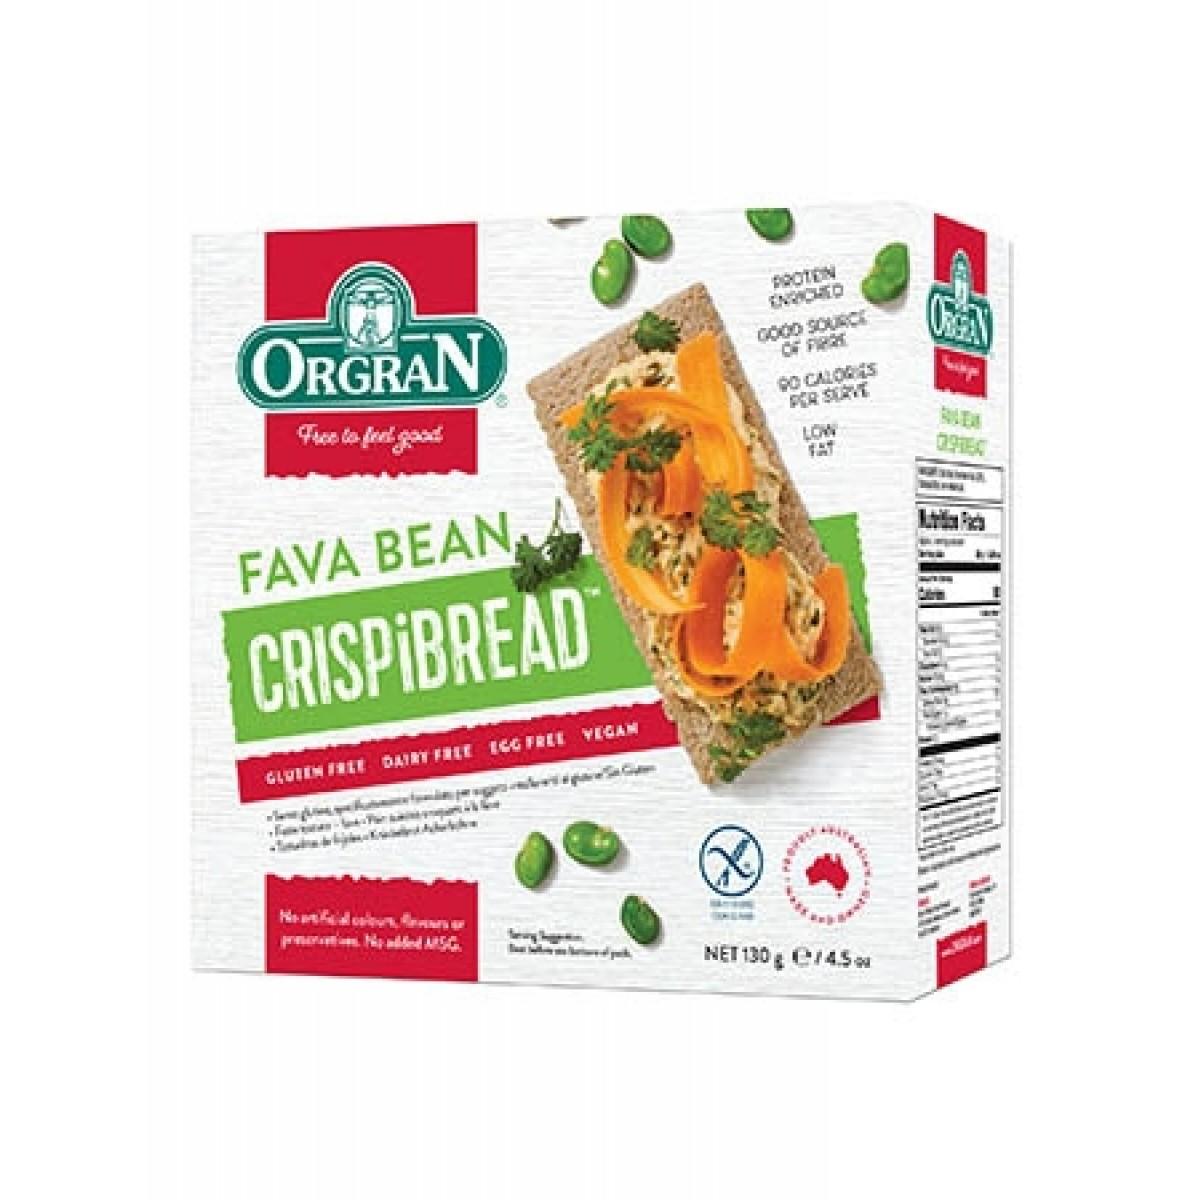 Fava Bean Crackers